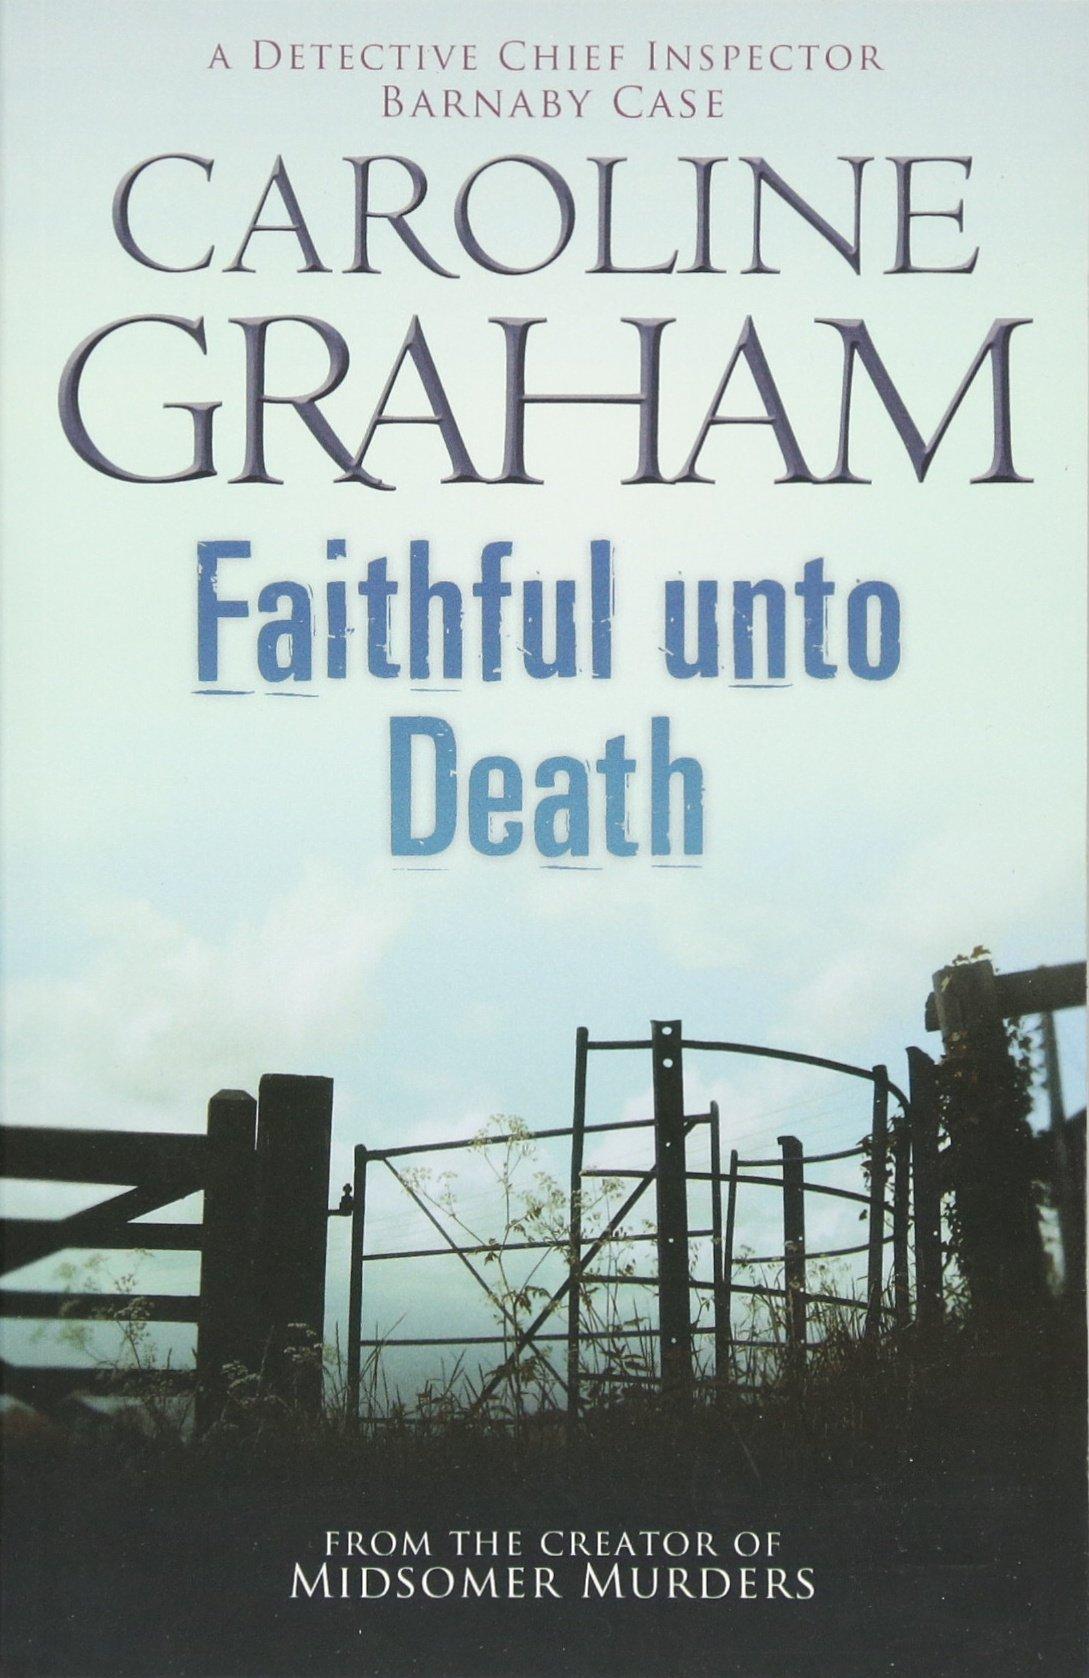 Download Faithful Unto Death. Caroline Graham (Detective Chief Inspector Barnaby Novels) PDF